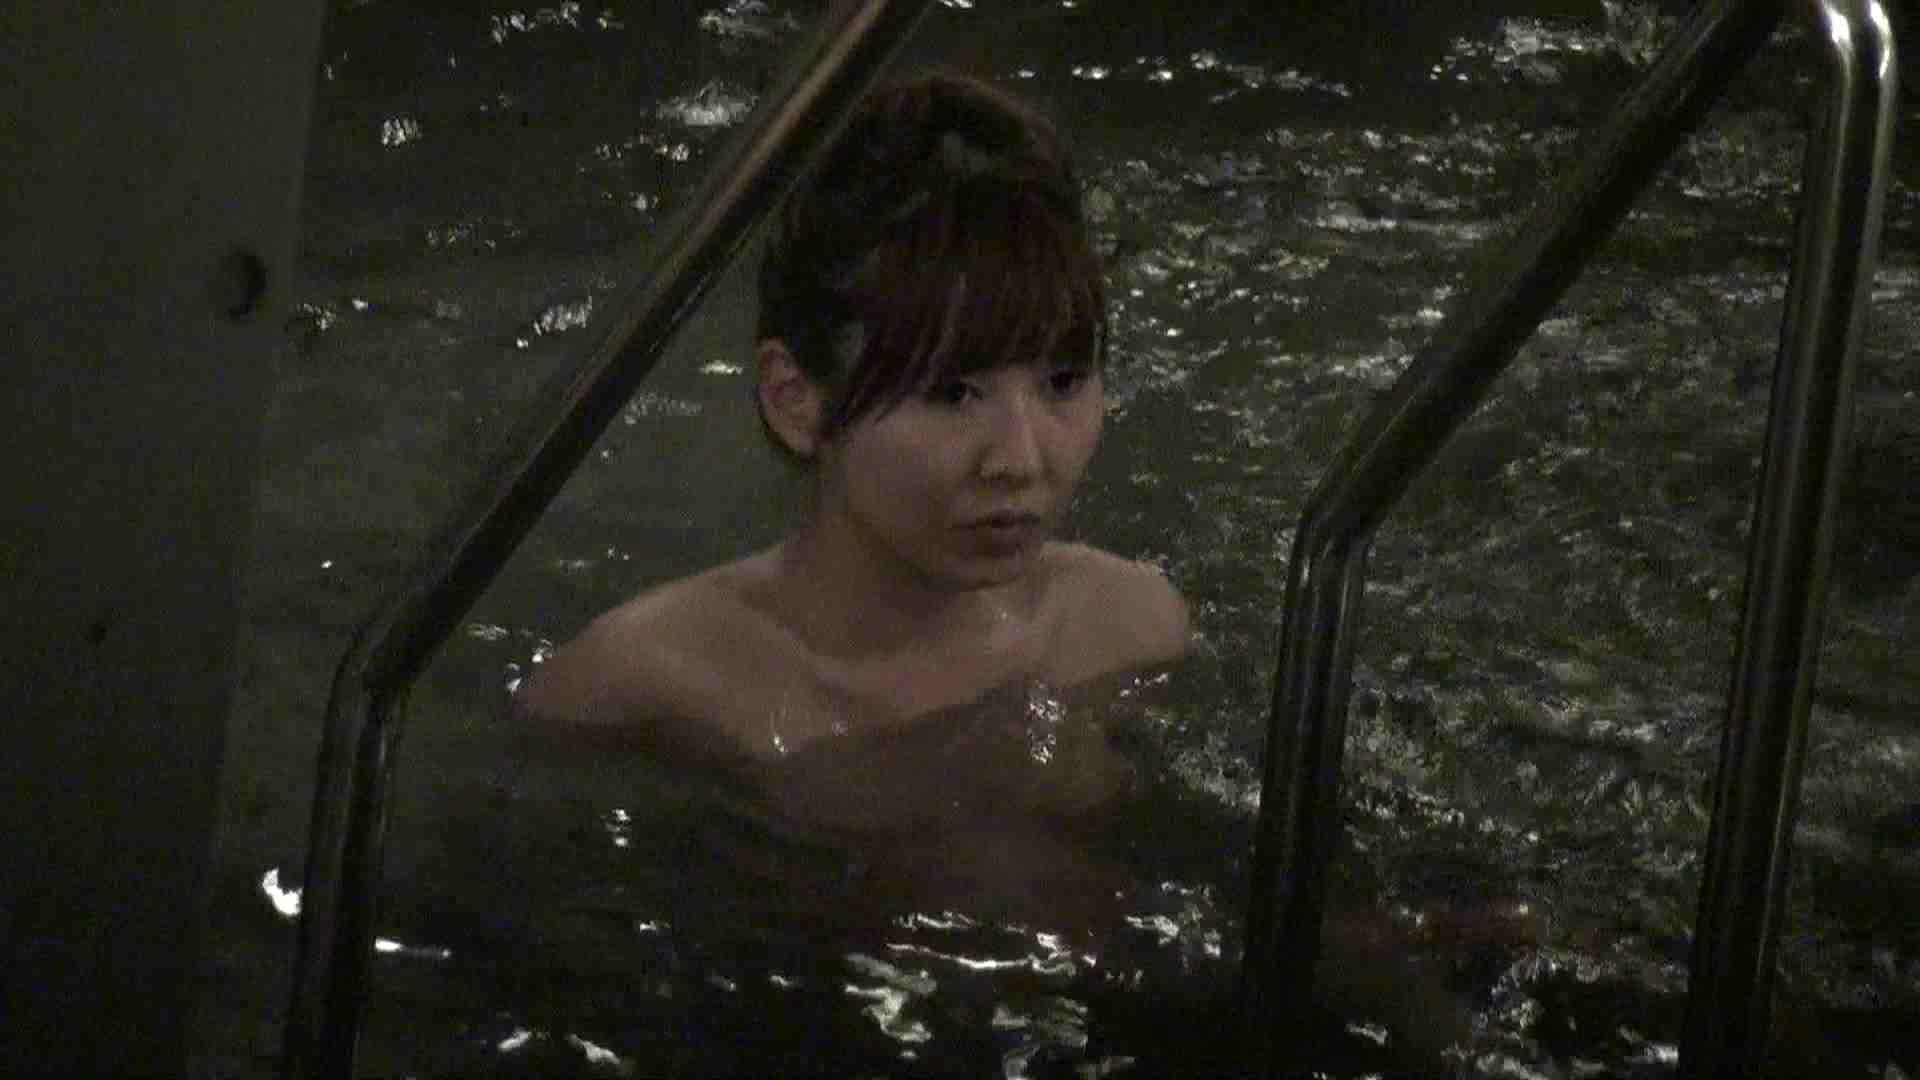 Aquaな露天風呂Vol.410 盗撮  73連発 63